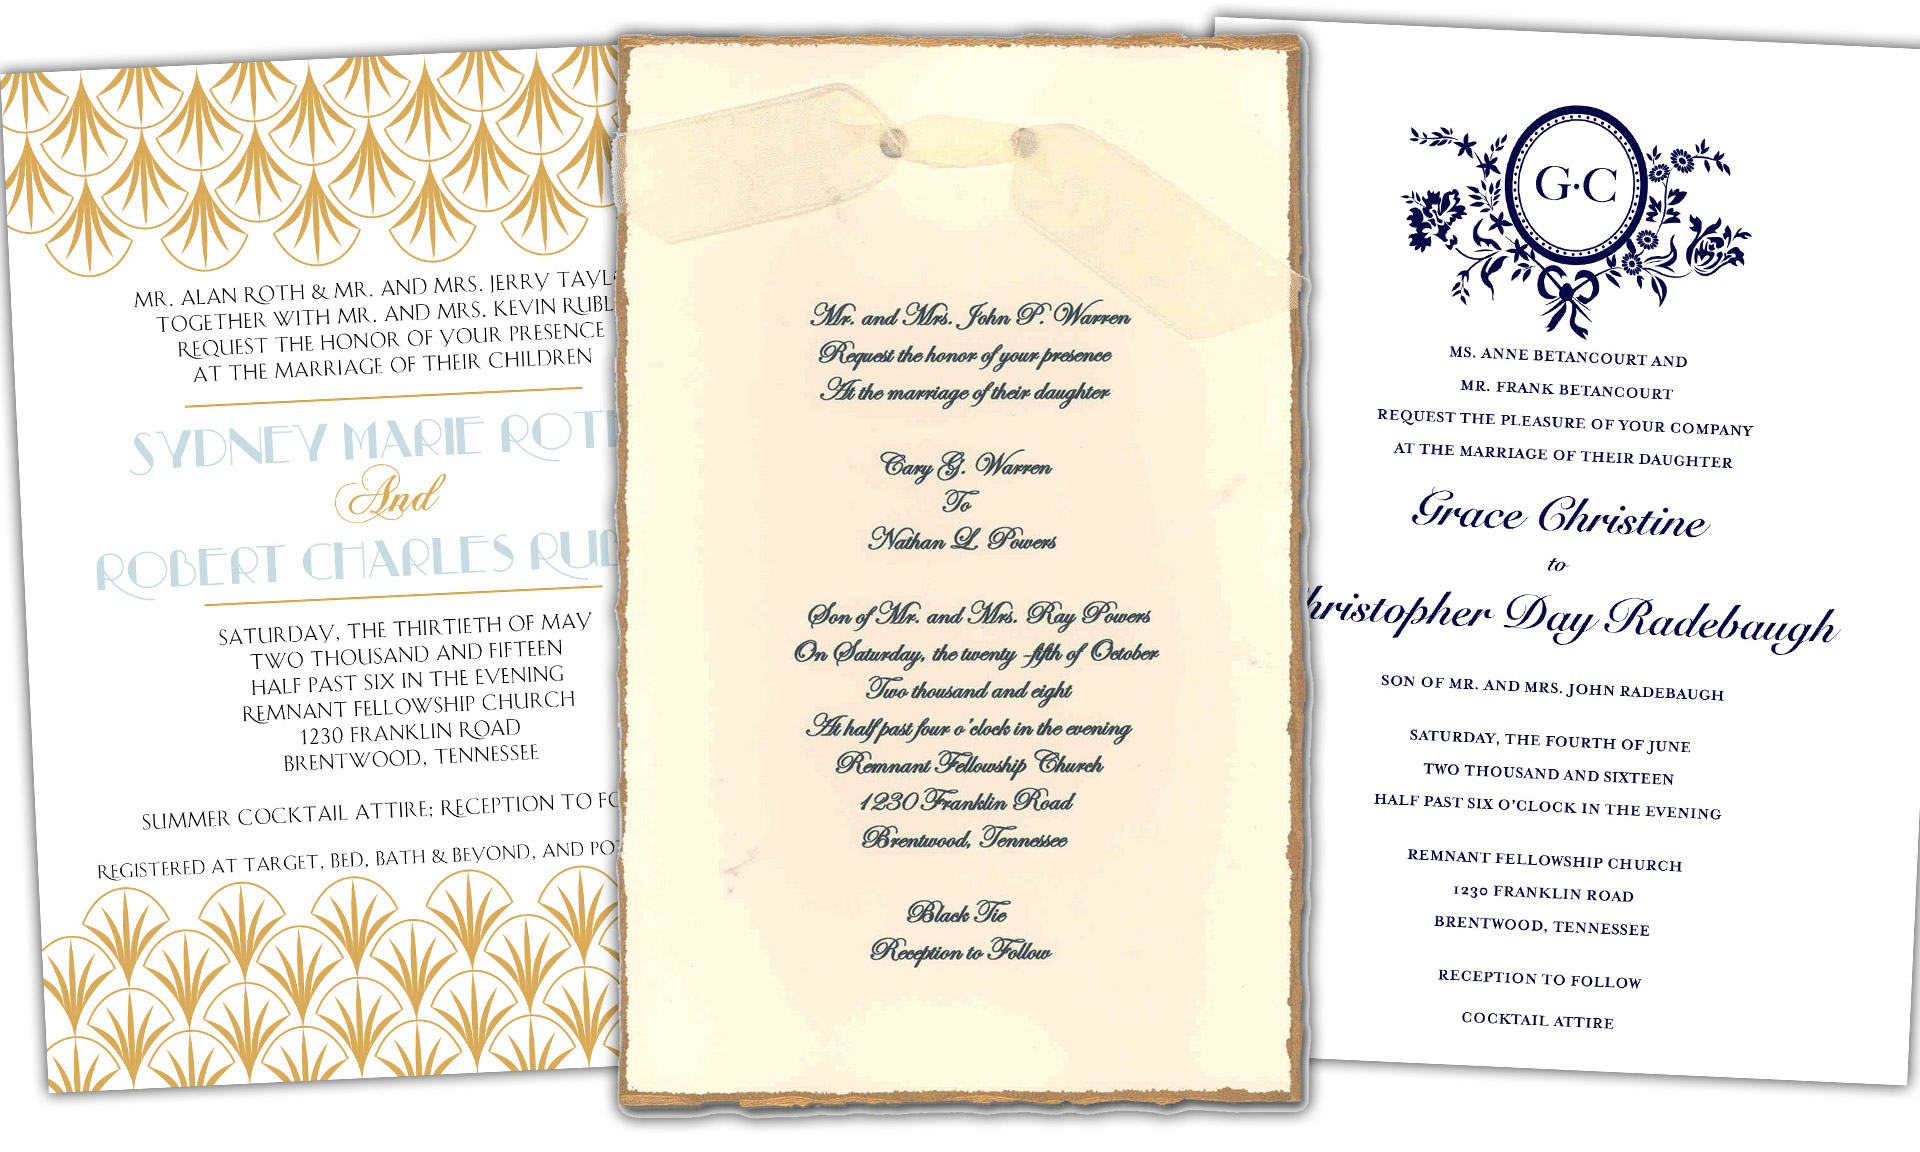 Remnant Fellowship Wedding Invitations